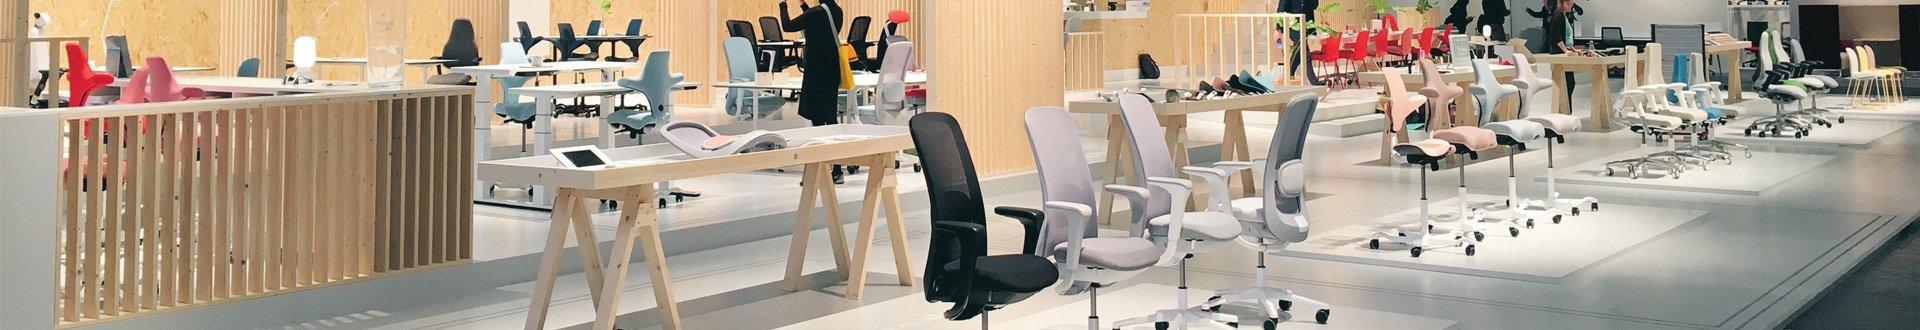 Buy Ergonomic Office Chairs